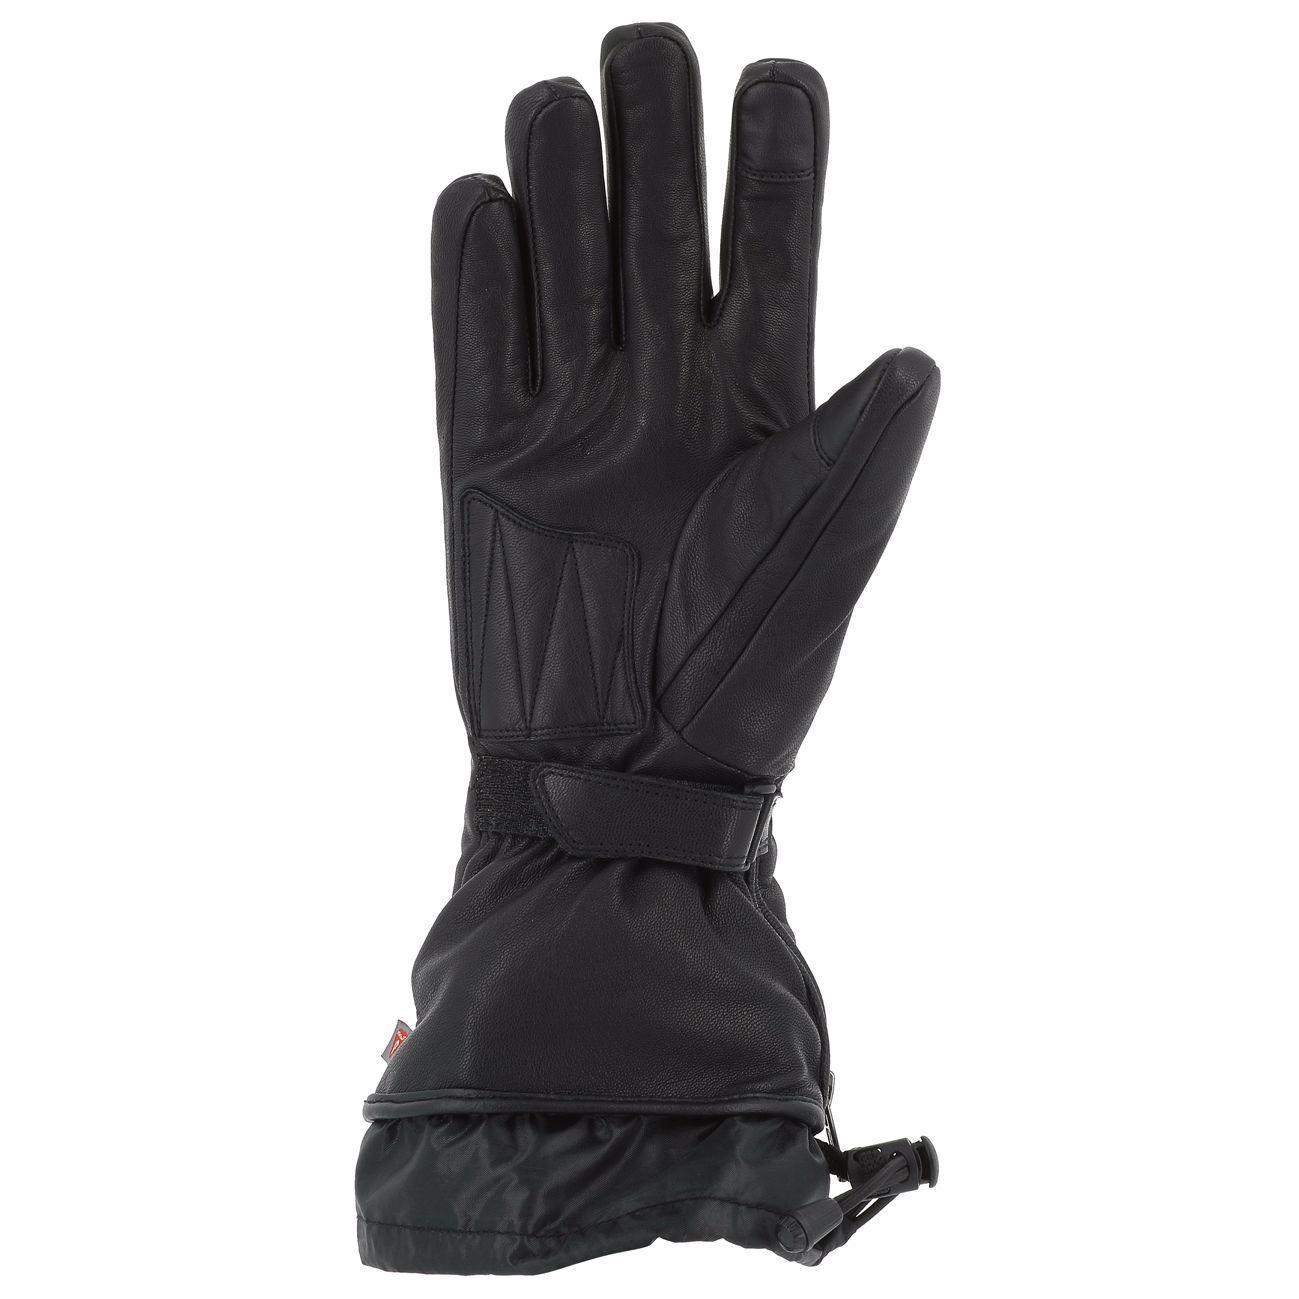 gants v quattro virago gants moto. Black Bedroom Furniture Sets. Home Design Ideas